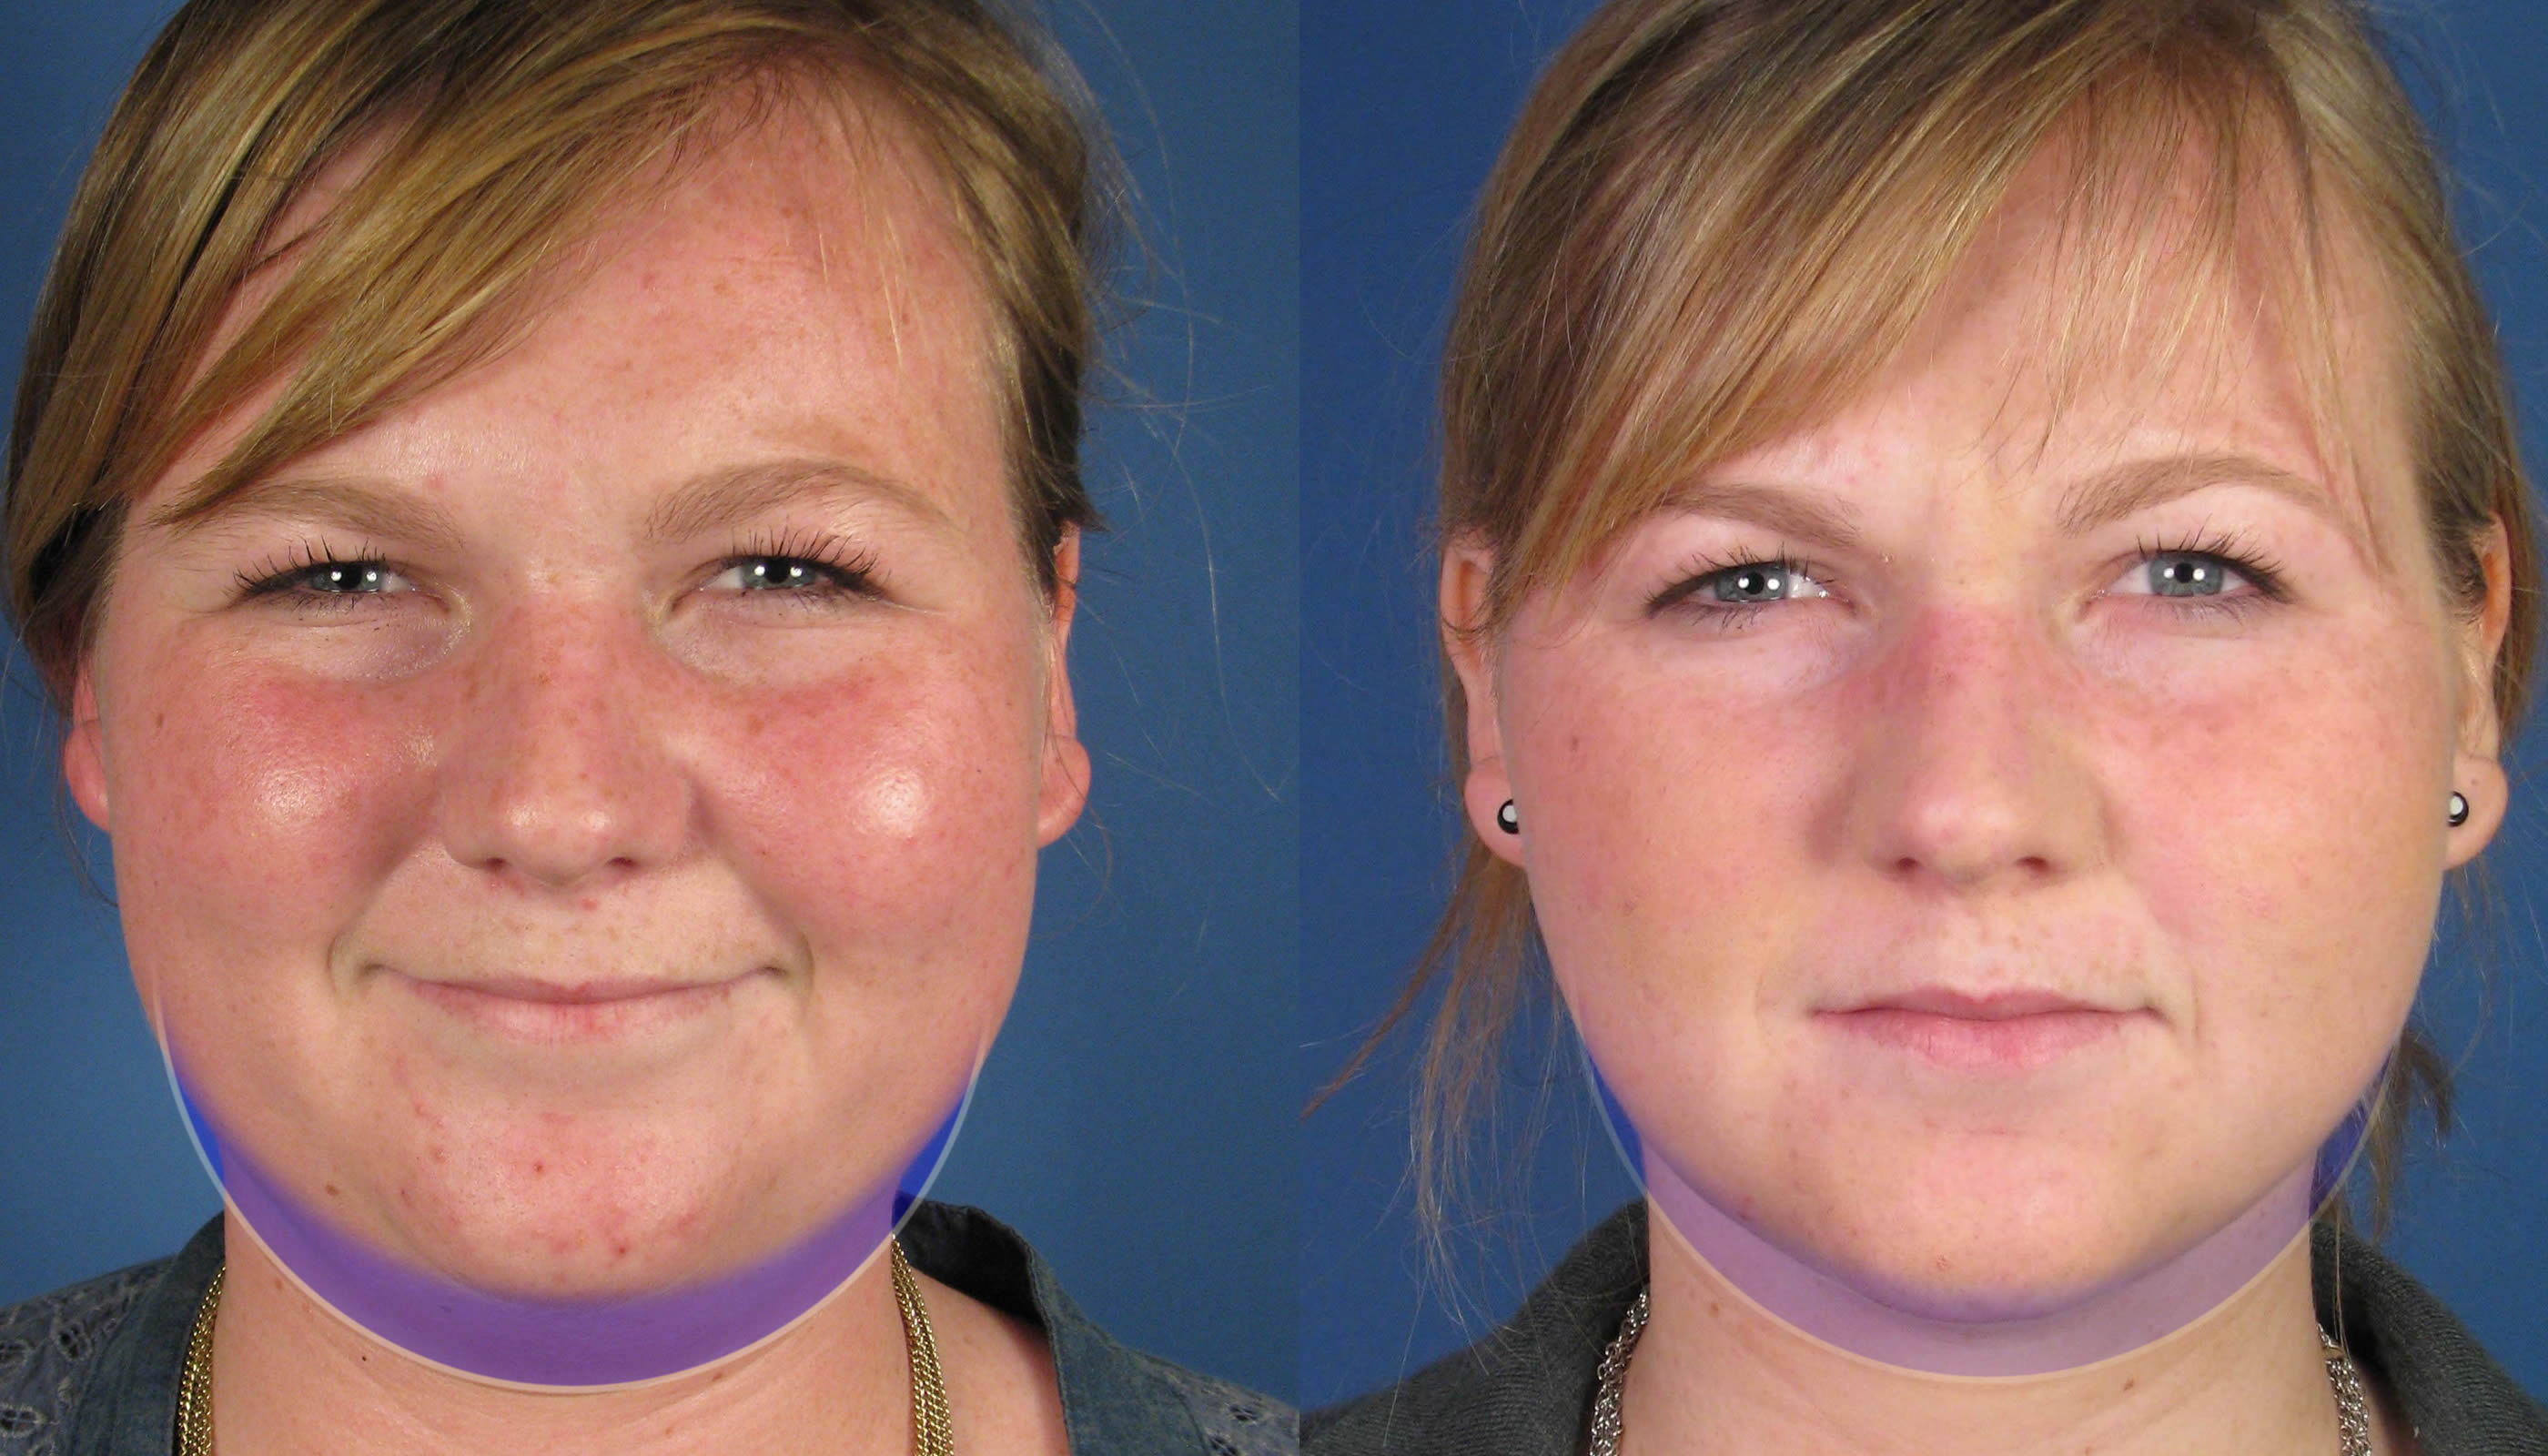 Update On Necklift With Platysmaplasty  U0026 Neck Liposuction